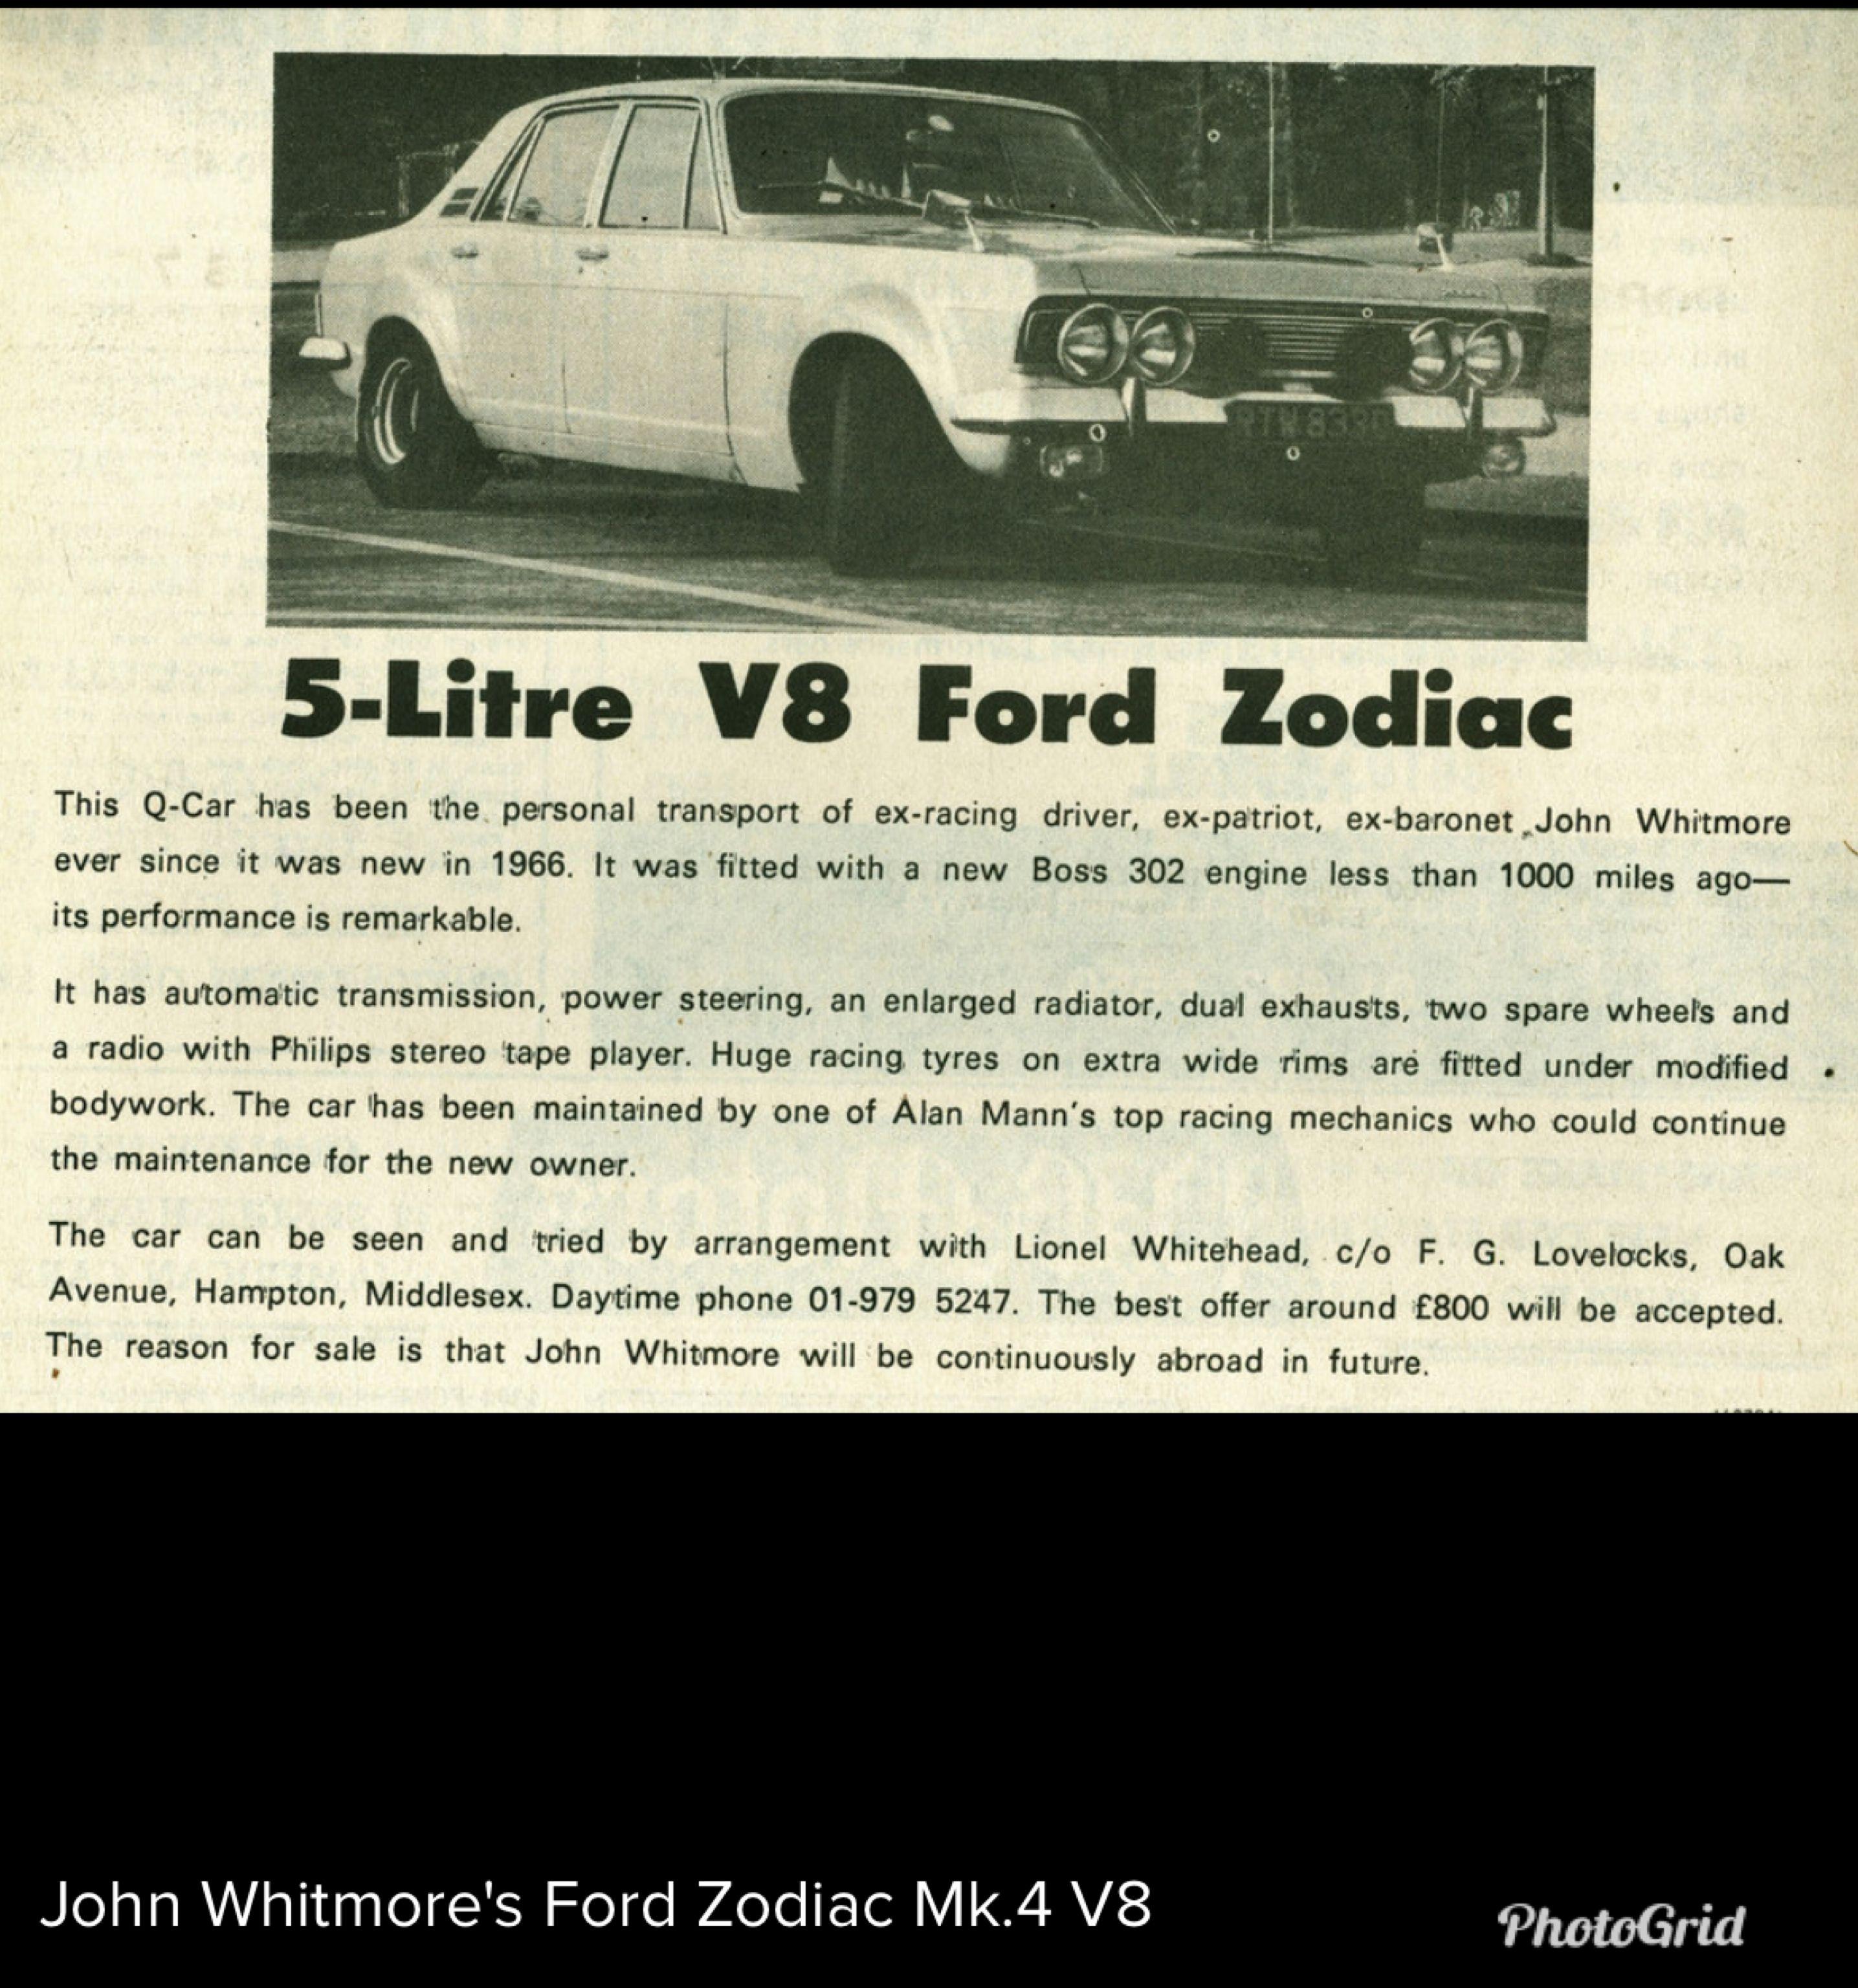 1973 Ford Zodiac Mark Iv V8 Scanned By Kevin Miller To Flickr